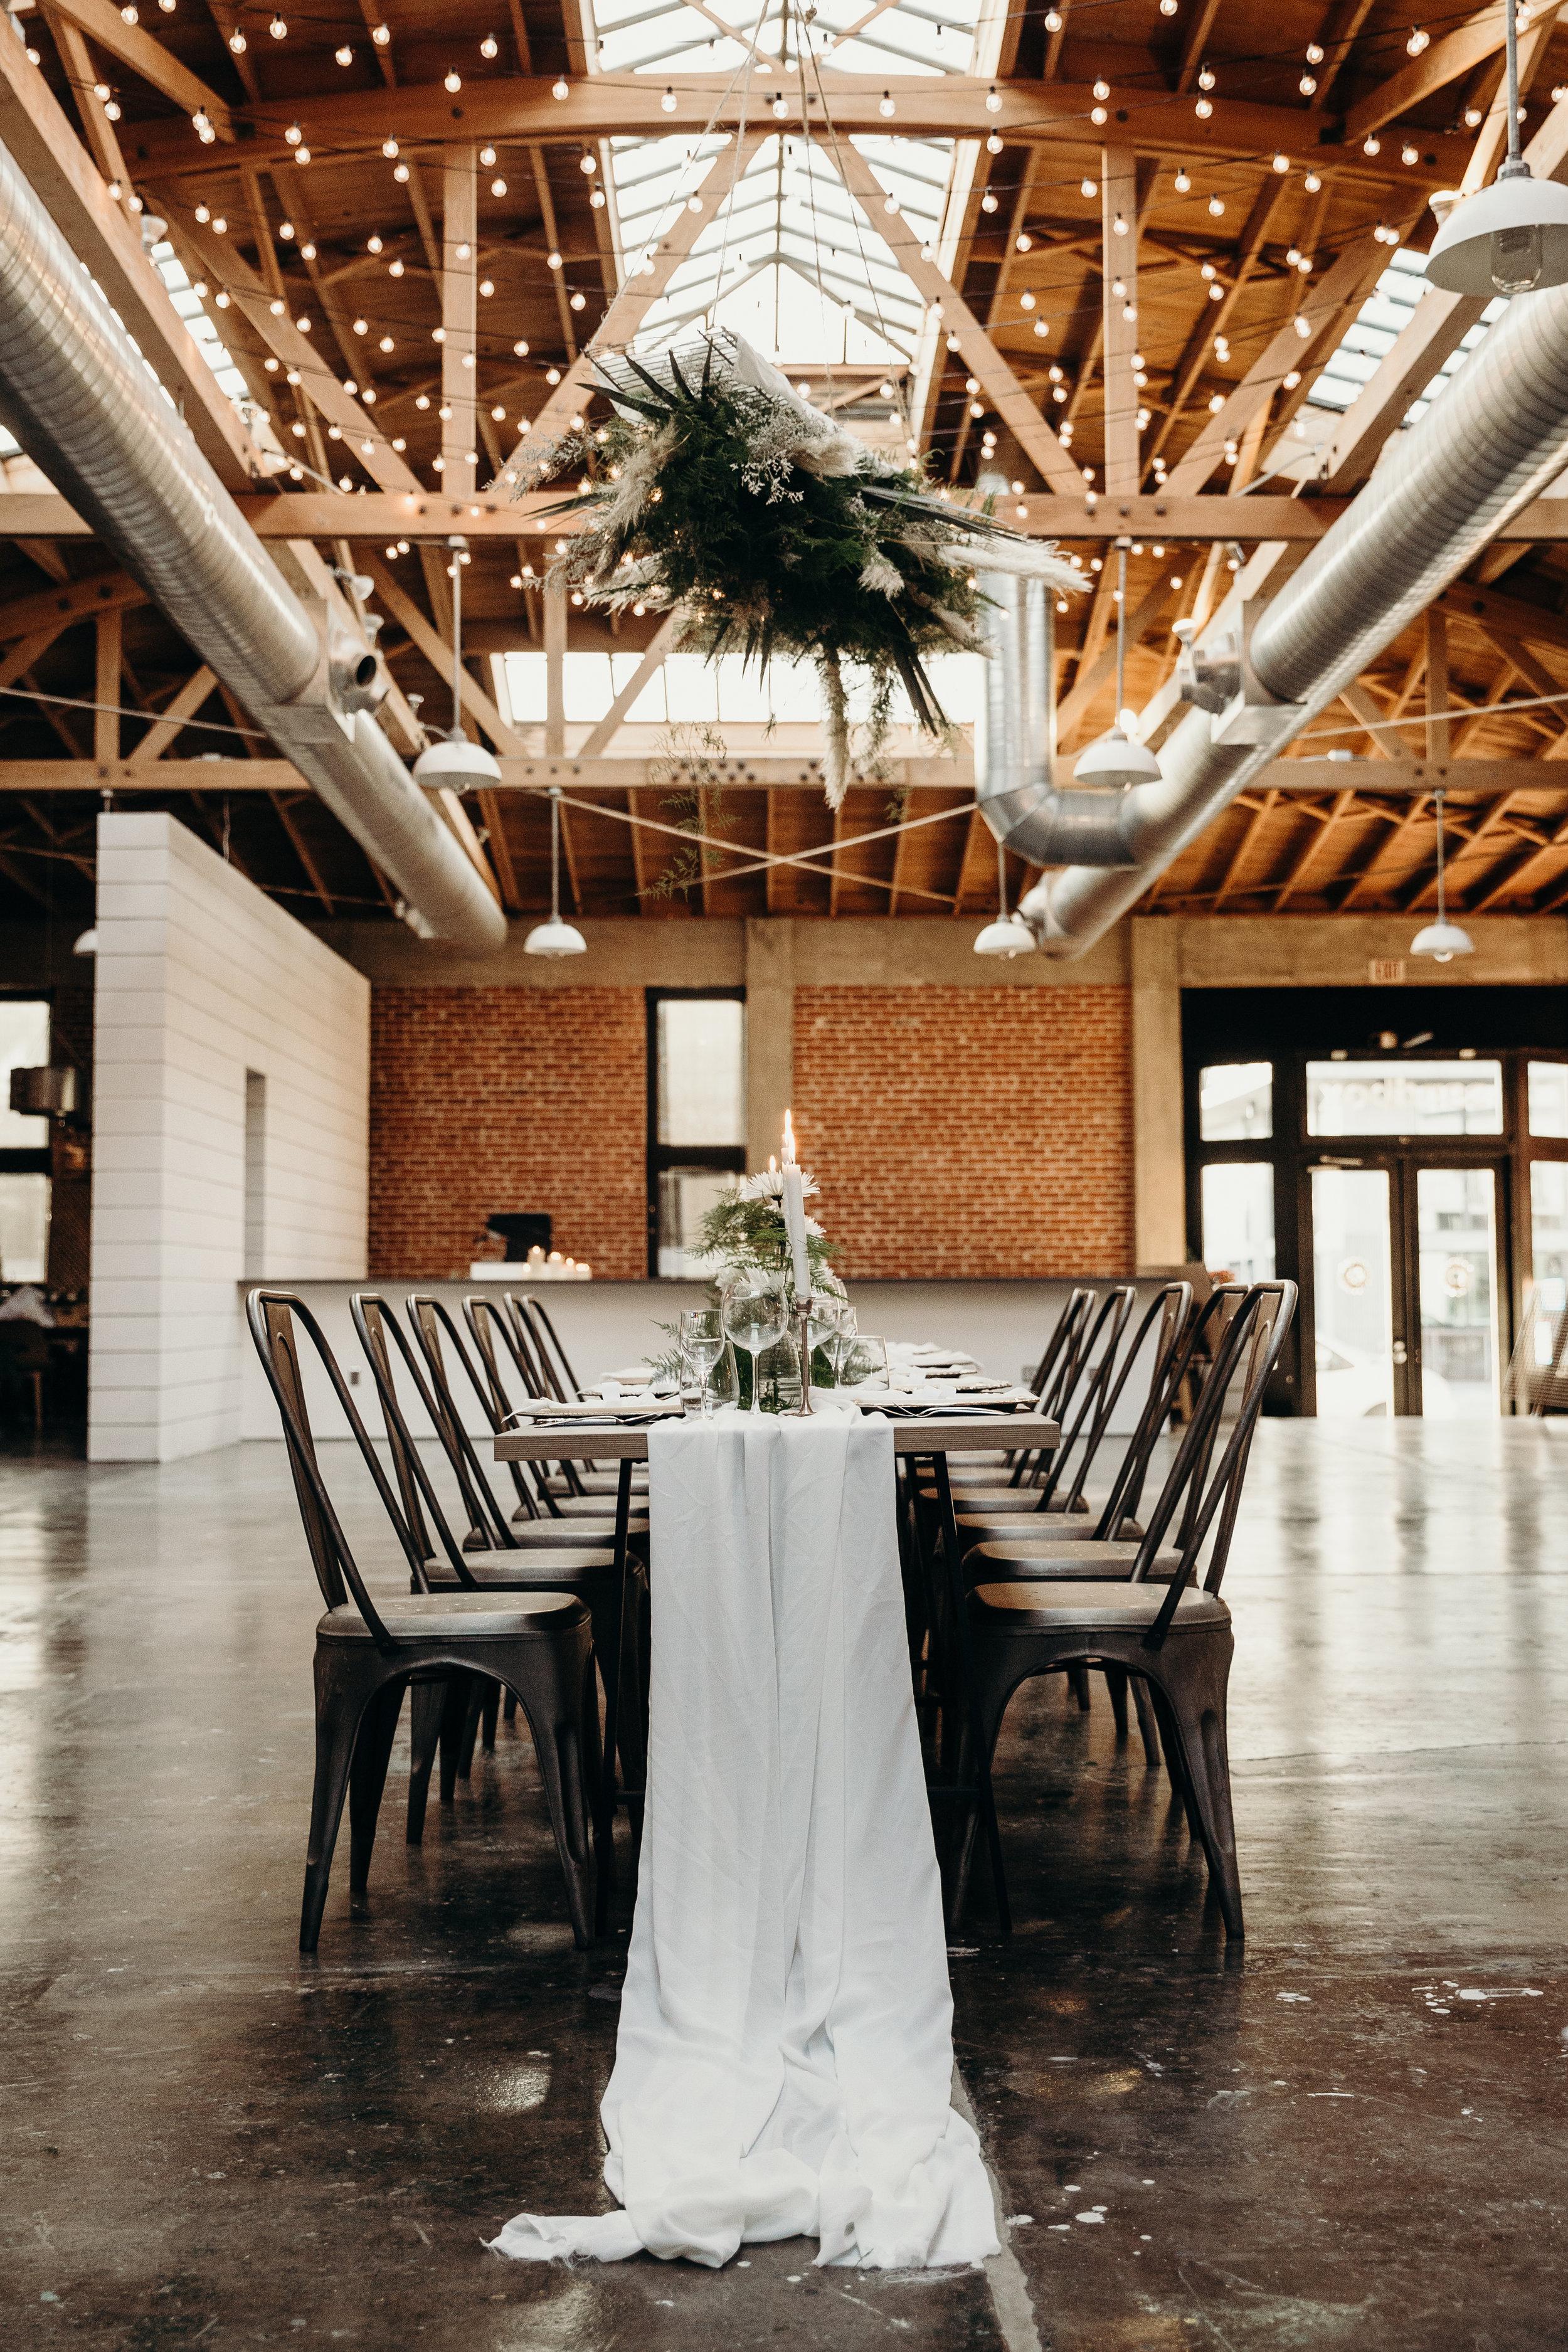 CHIC, MODERN + SLEEK. - A ROMANTIC DINNER WEDDING FOR THE MINIMALIST.